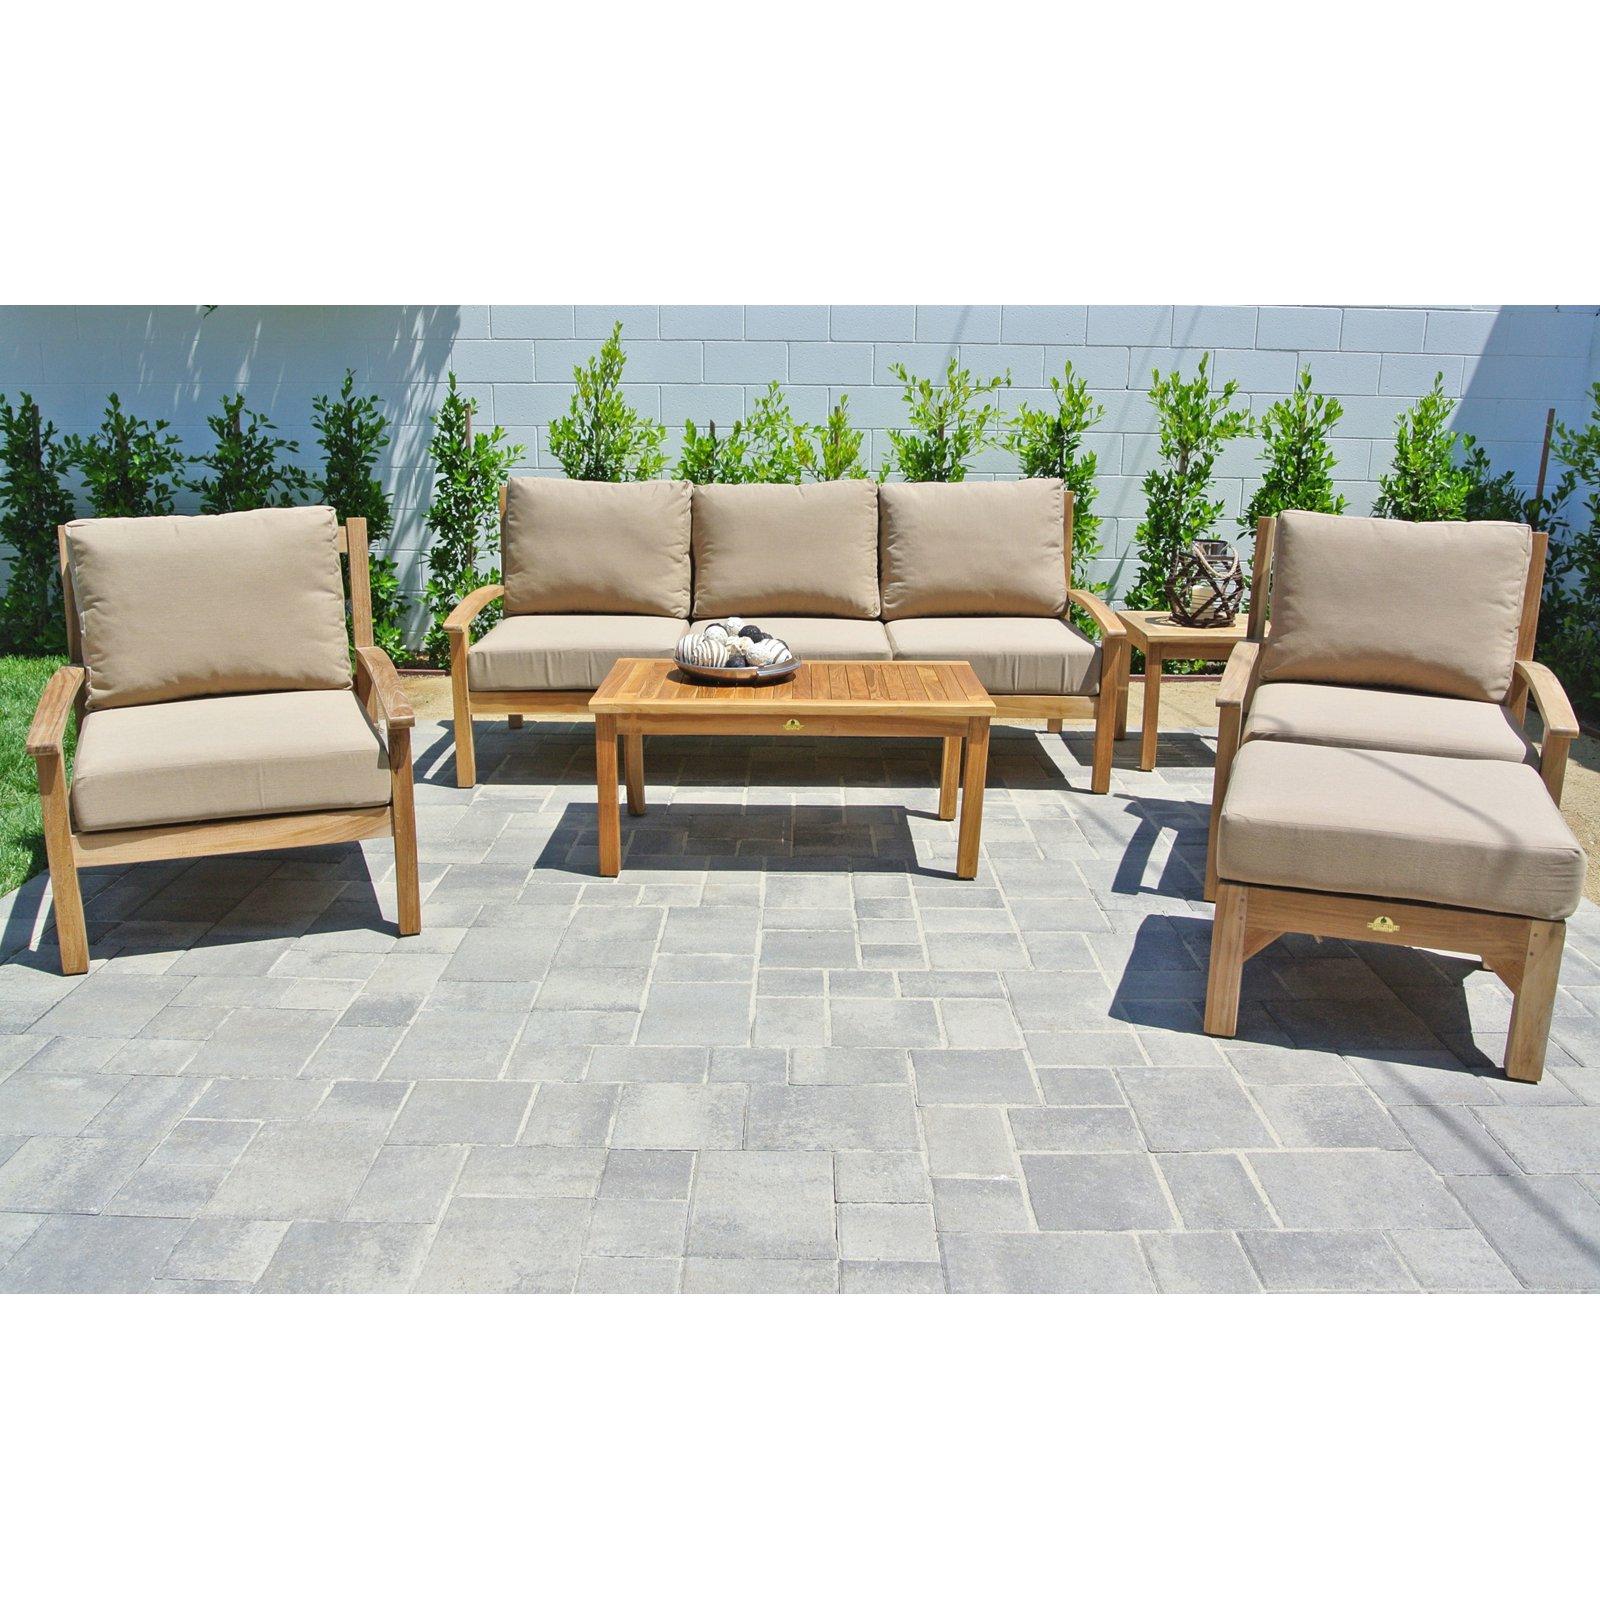 Willow Creek Designs Huntington Teak 6 Piece Deep Seating Patio Set